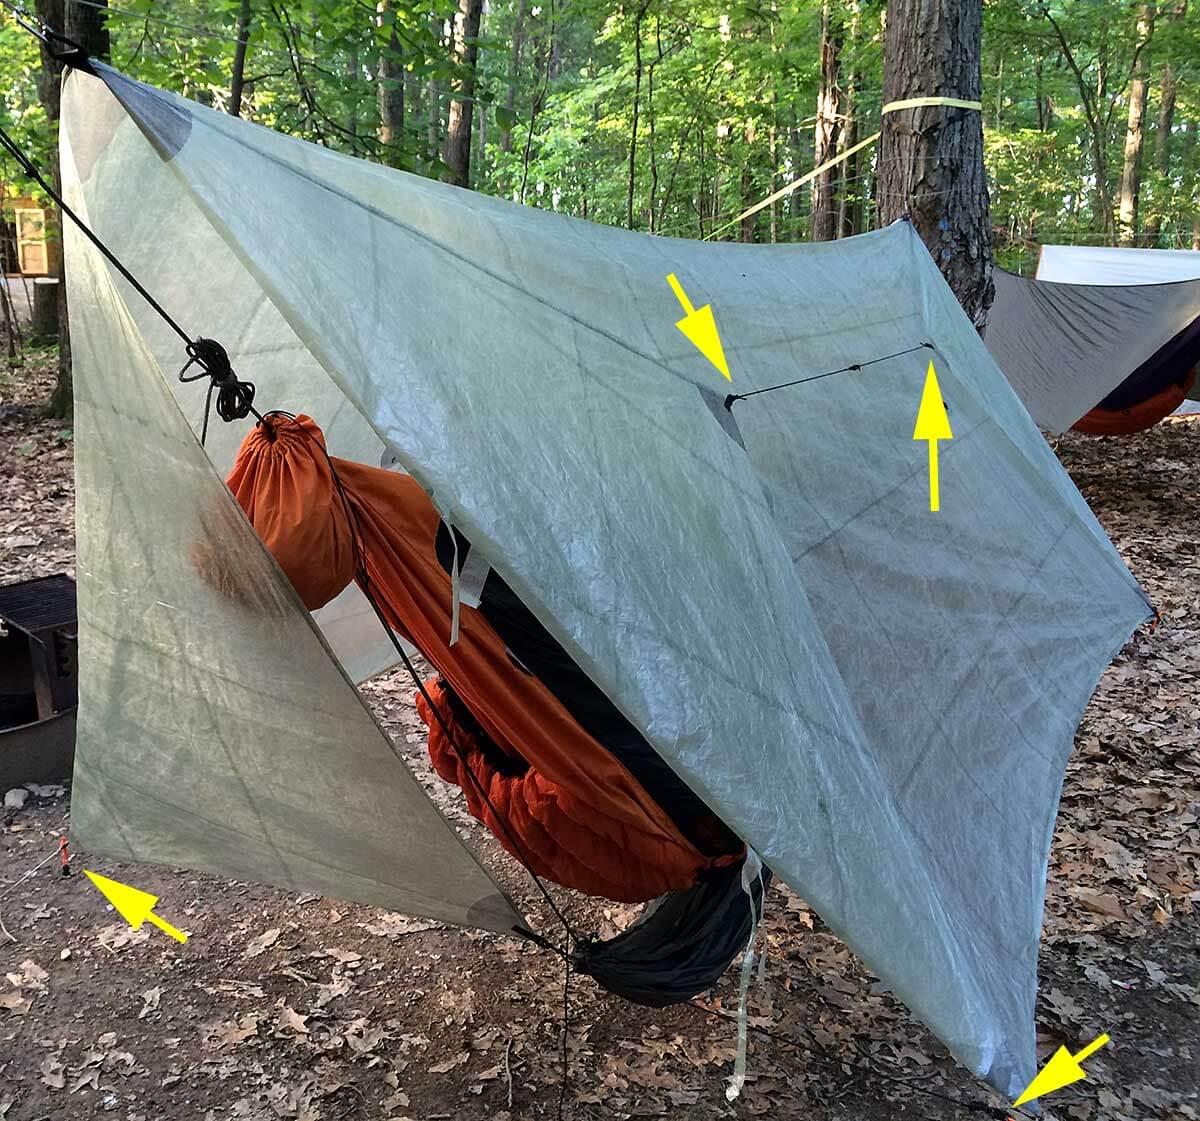 hammock-doors-2-1200 - Great Method To Manage Hammock Tarp Doors - Adventure Alan